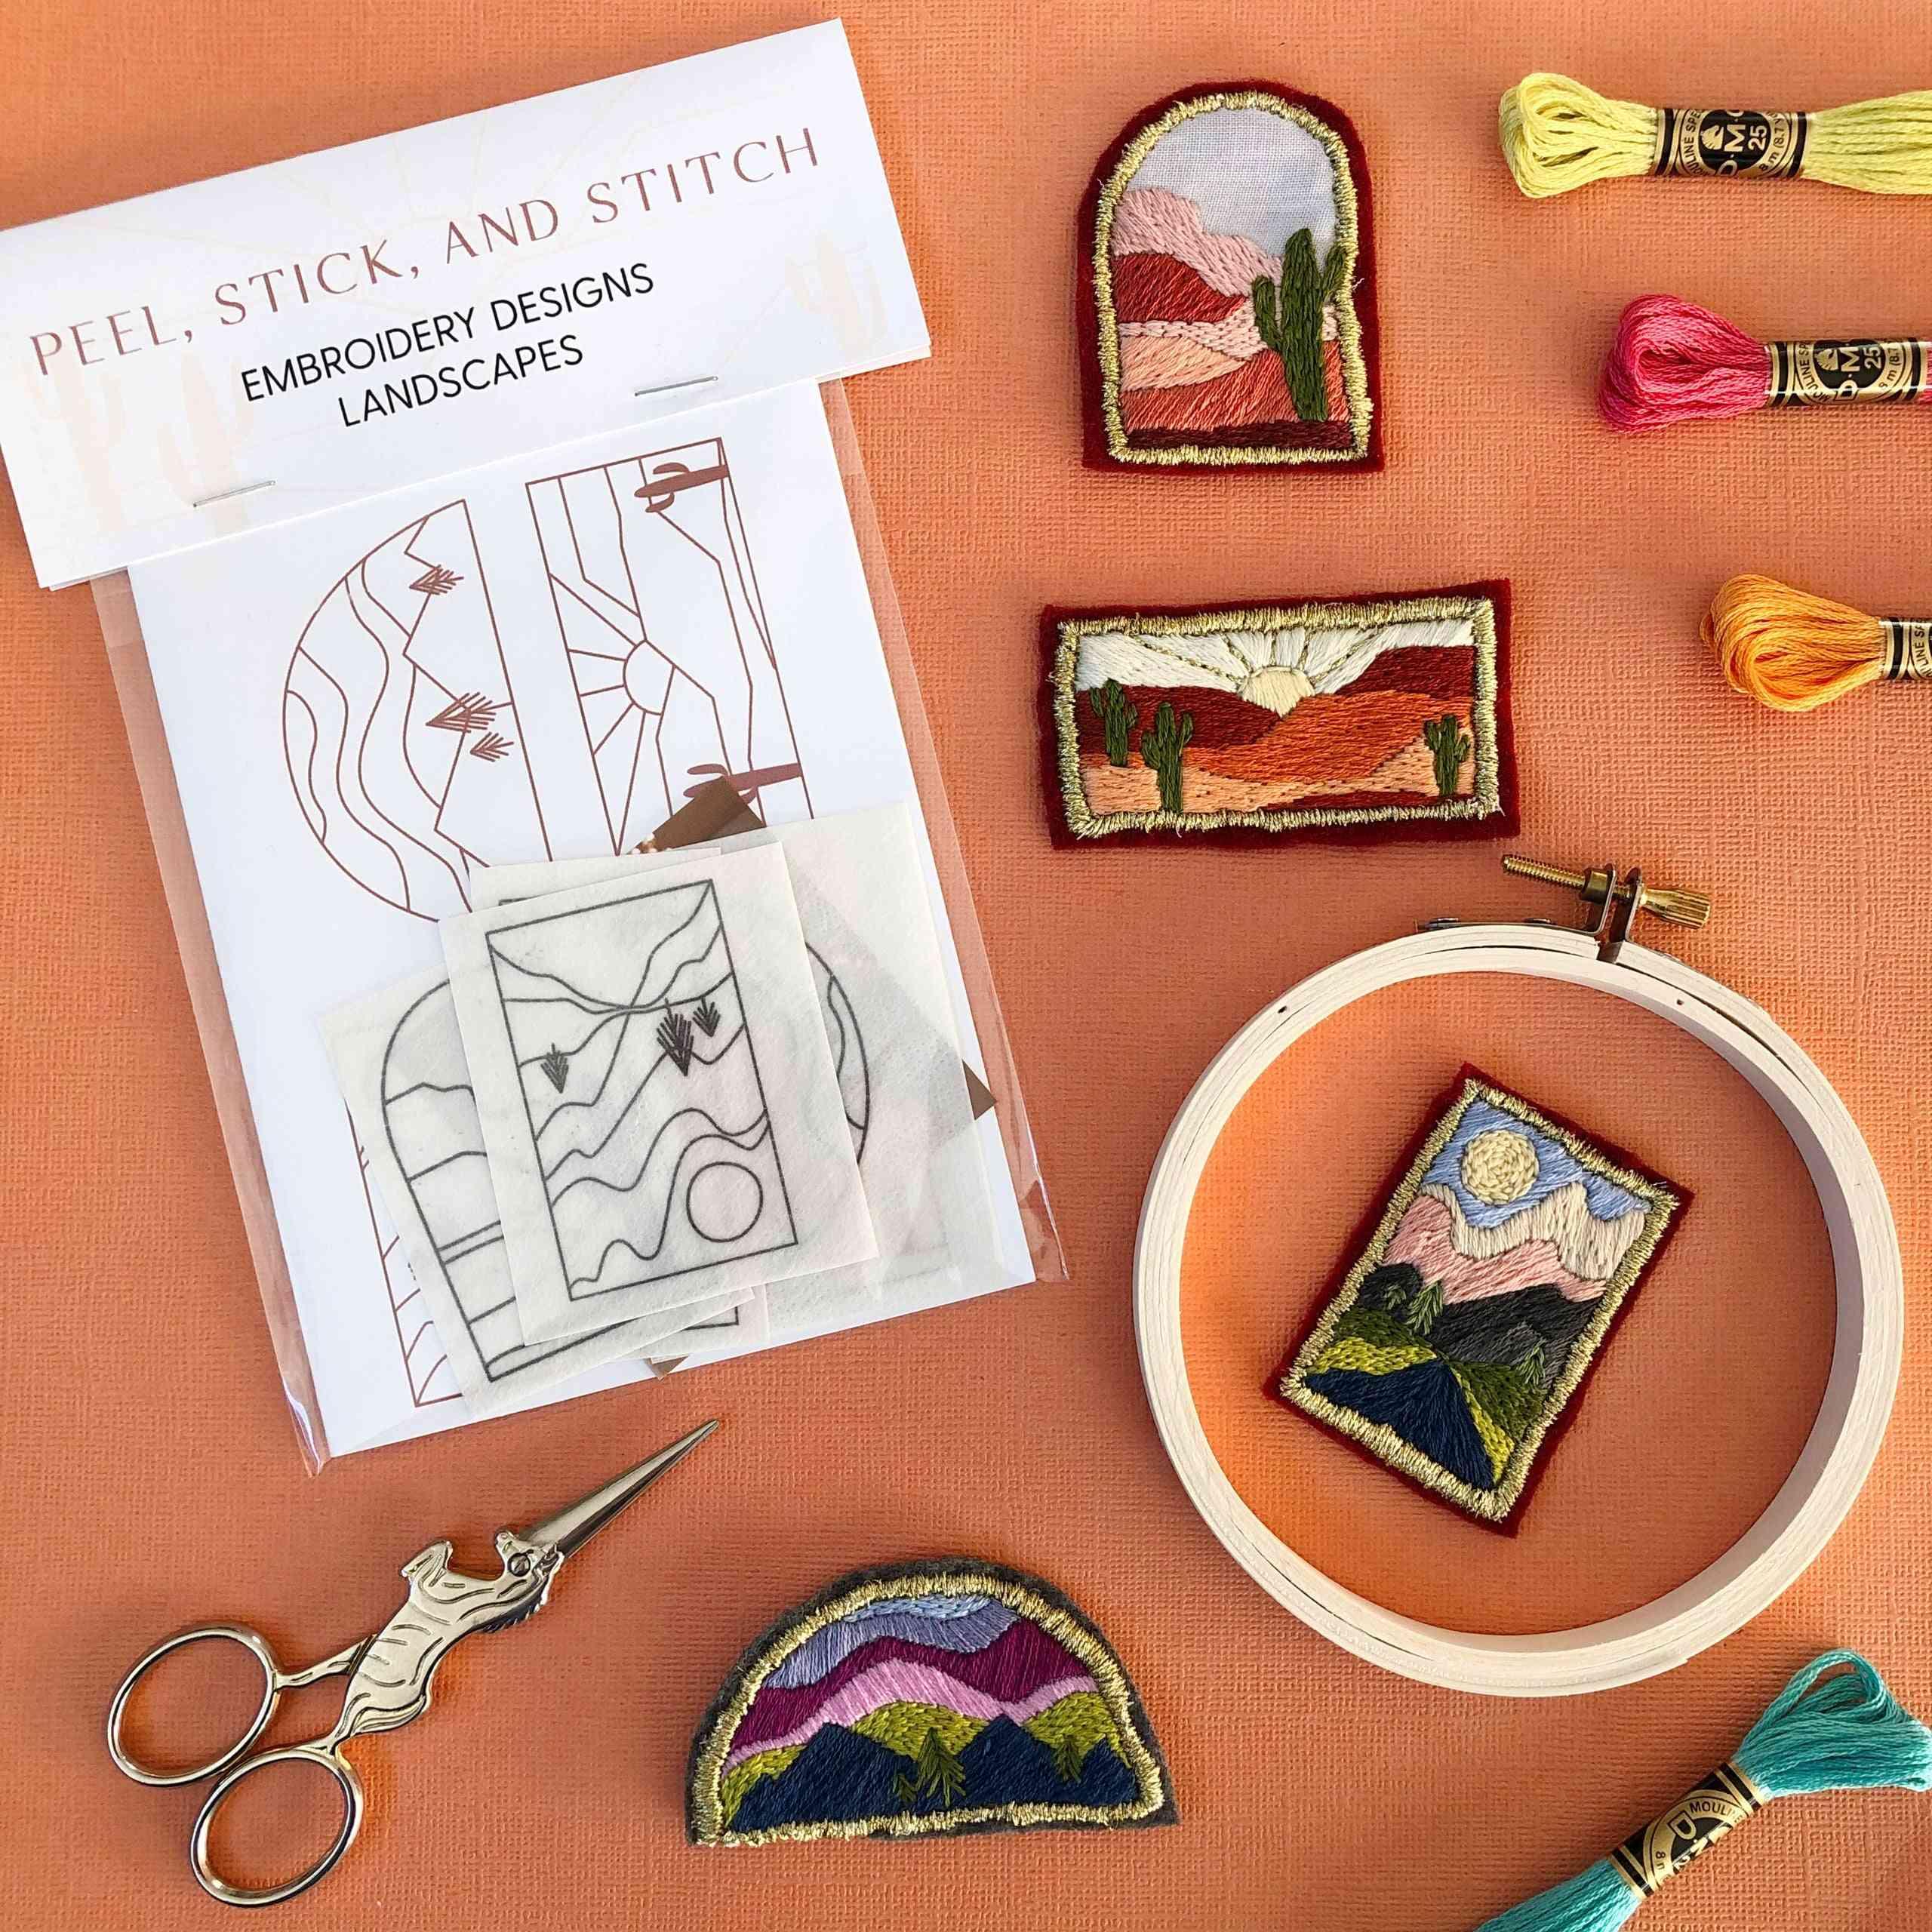 Diy Embroidery Pattern. Peel Stick And Stitch Landscape Designs